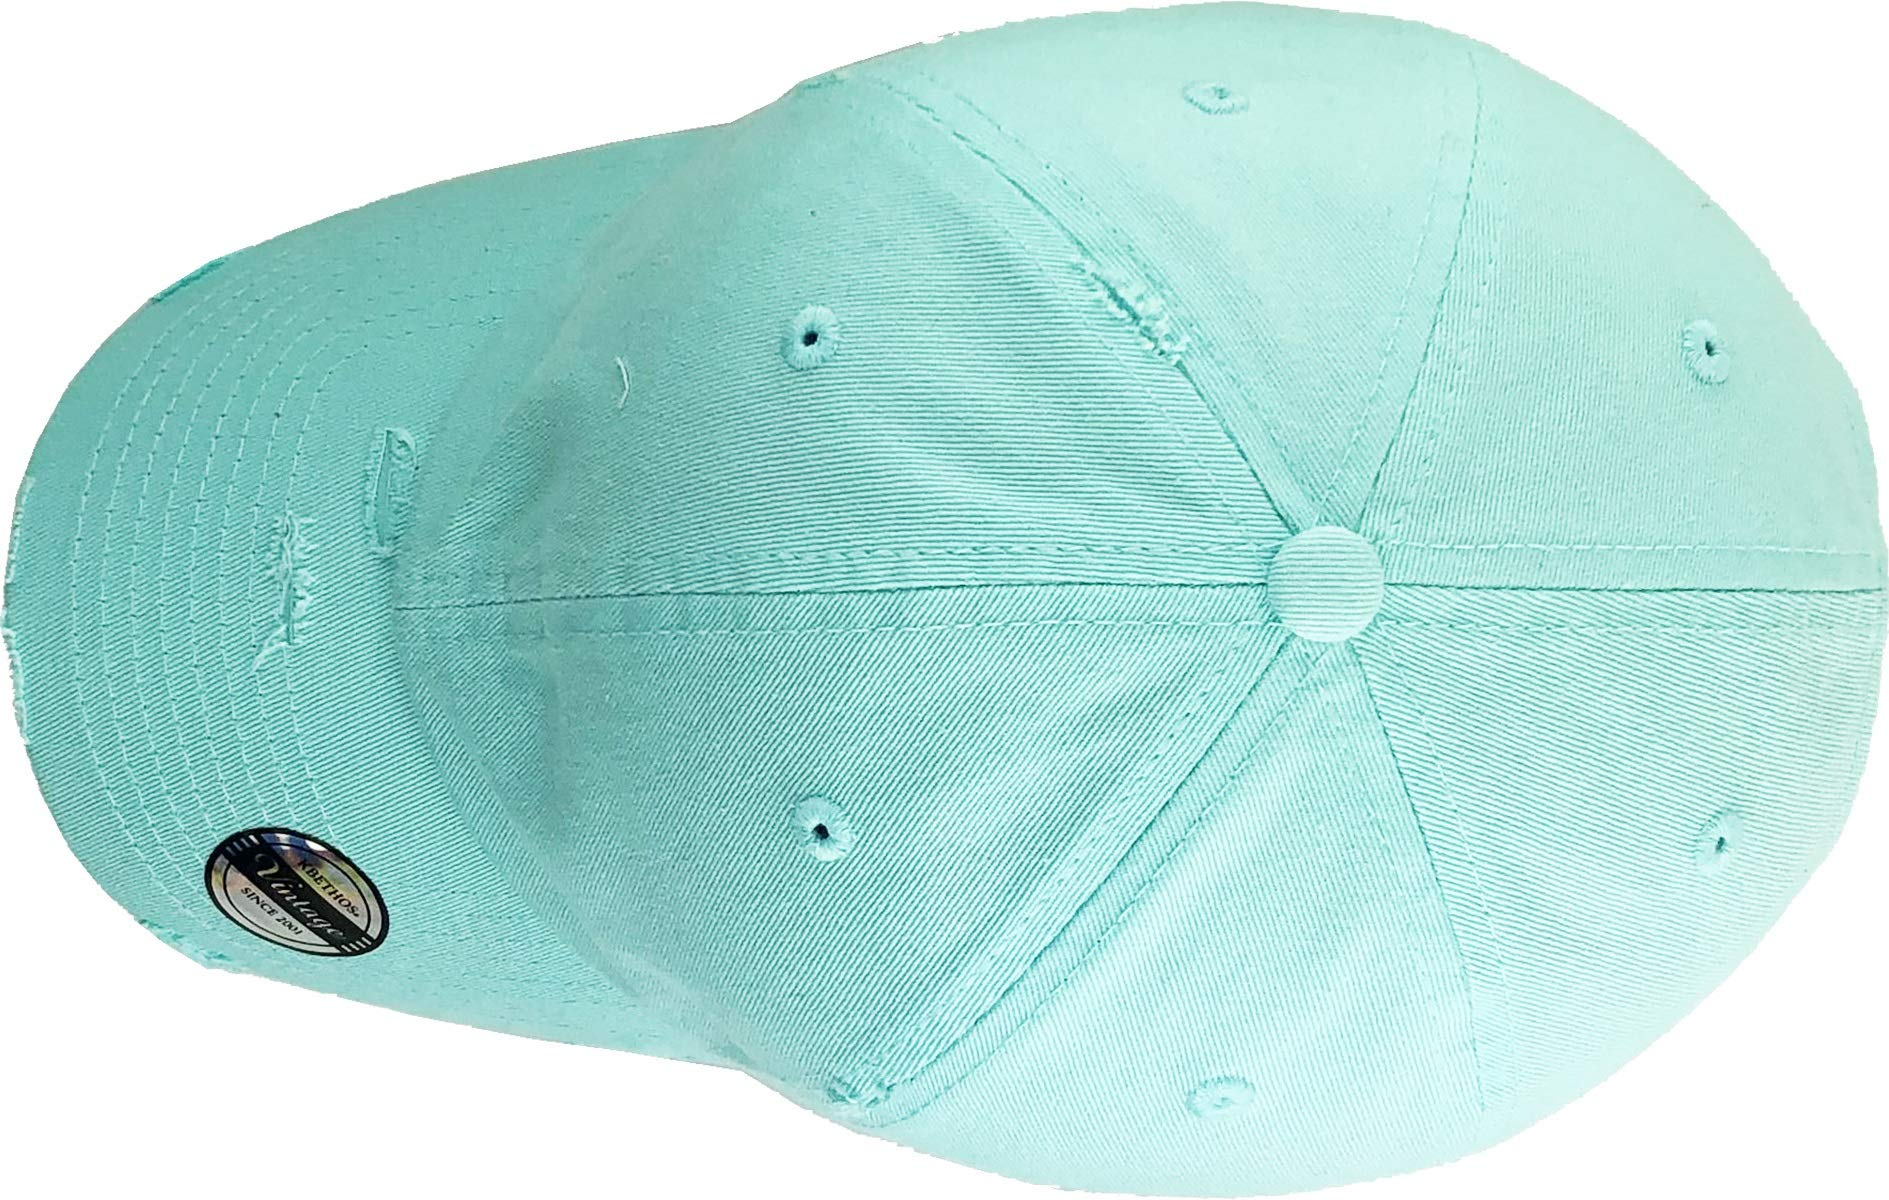 Nolabel Baby Baseball Cap Kids Toddler Breathable Adjustable Snapback Sun Protection Trucker Hat